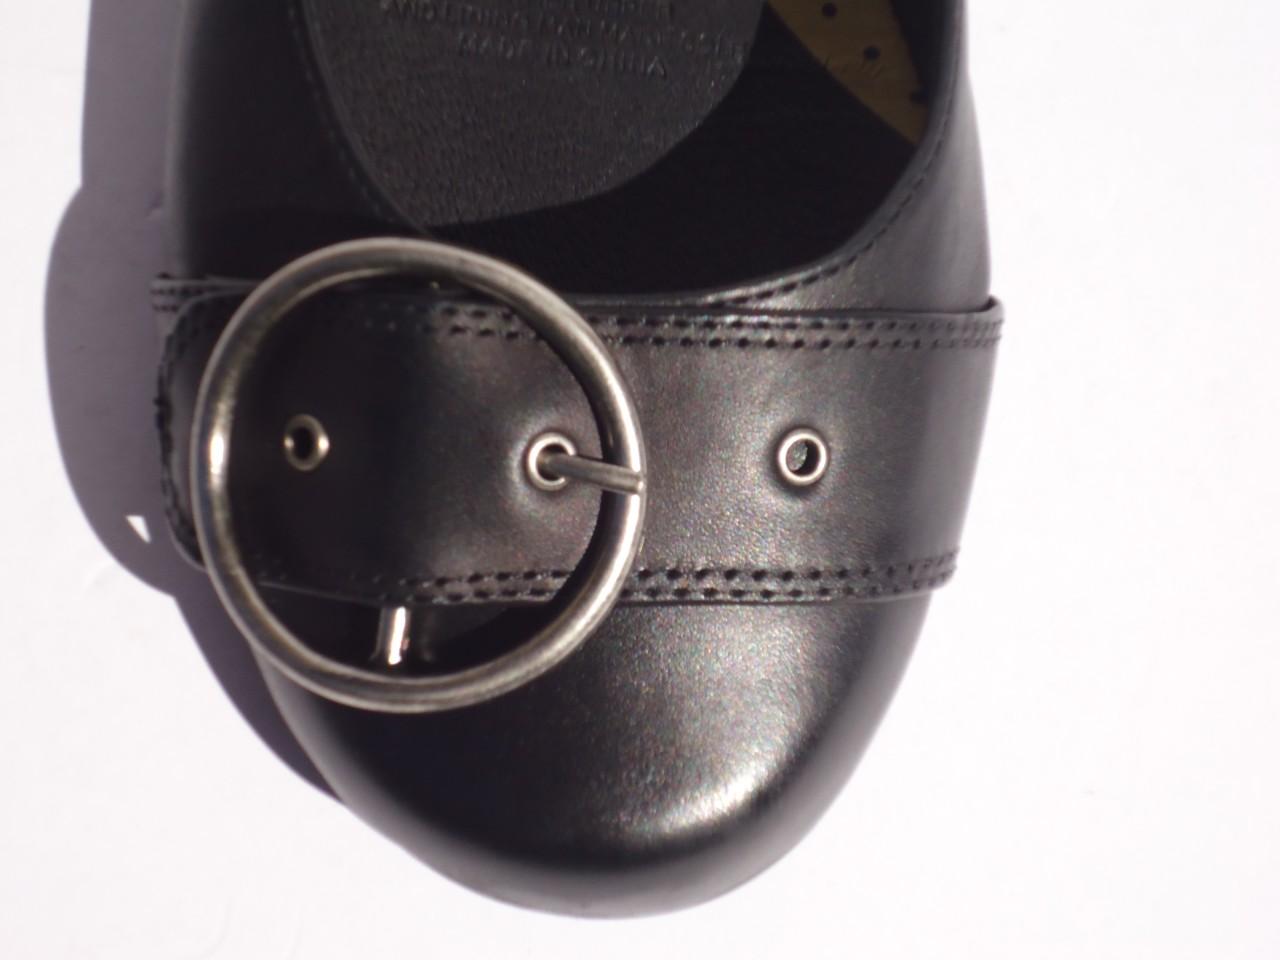 New-Womens-Leather-Shoe-Flat-Supersoft-Diana-Ferrari-Black-Sz-6-7-8-9-10-11-12